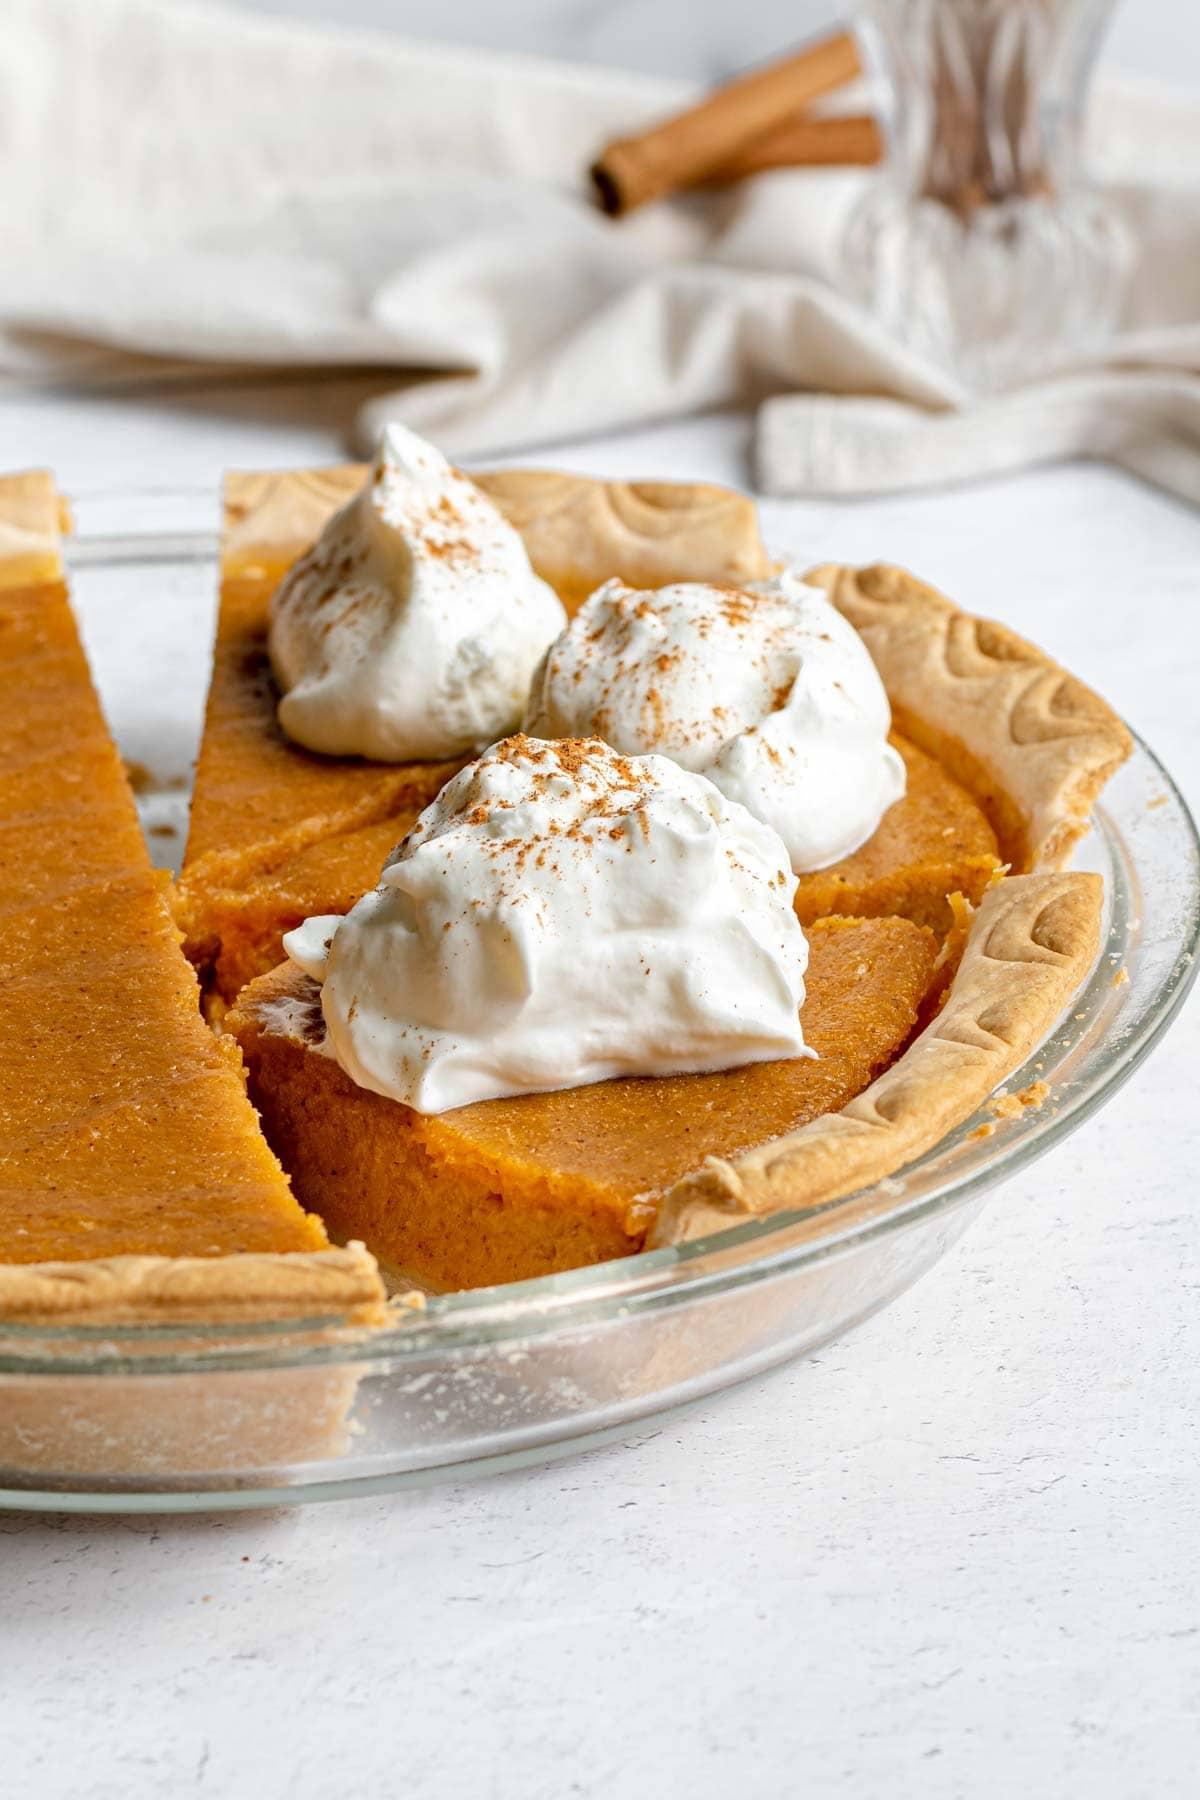 Sweet Potato Pie in pie dish